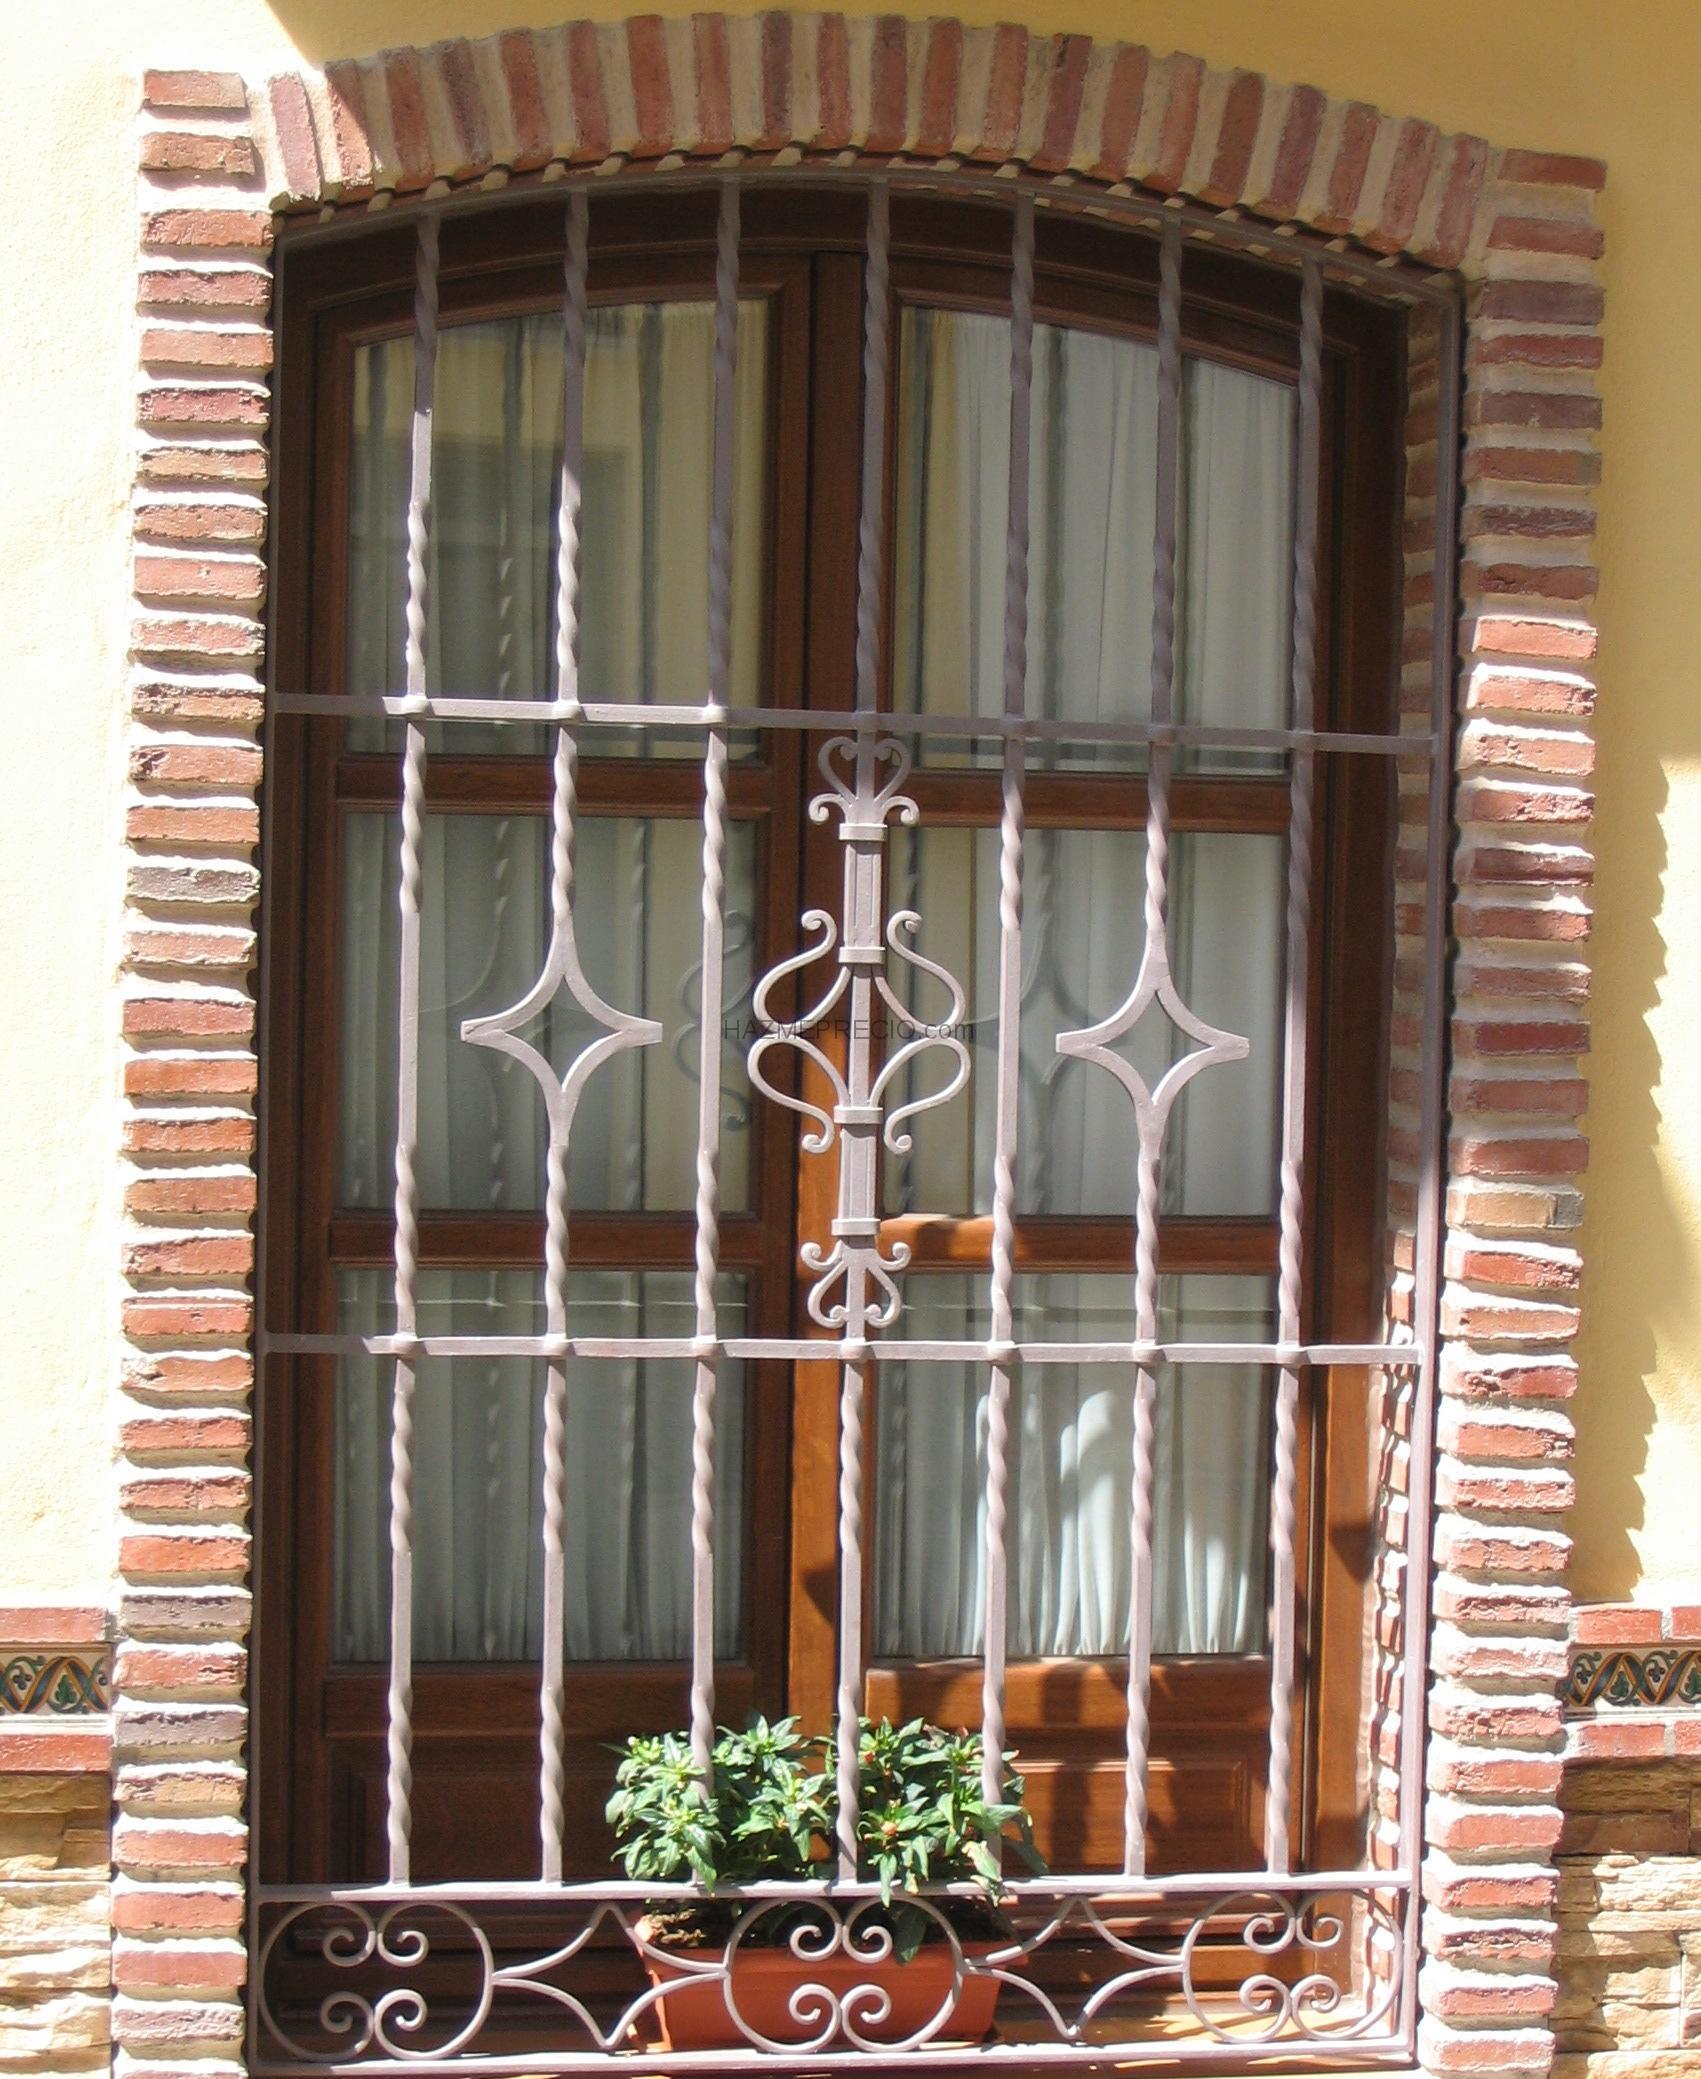 Empresas de puertas en malaga for Puertas metalicas malaga